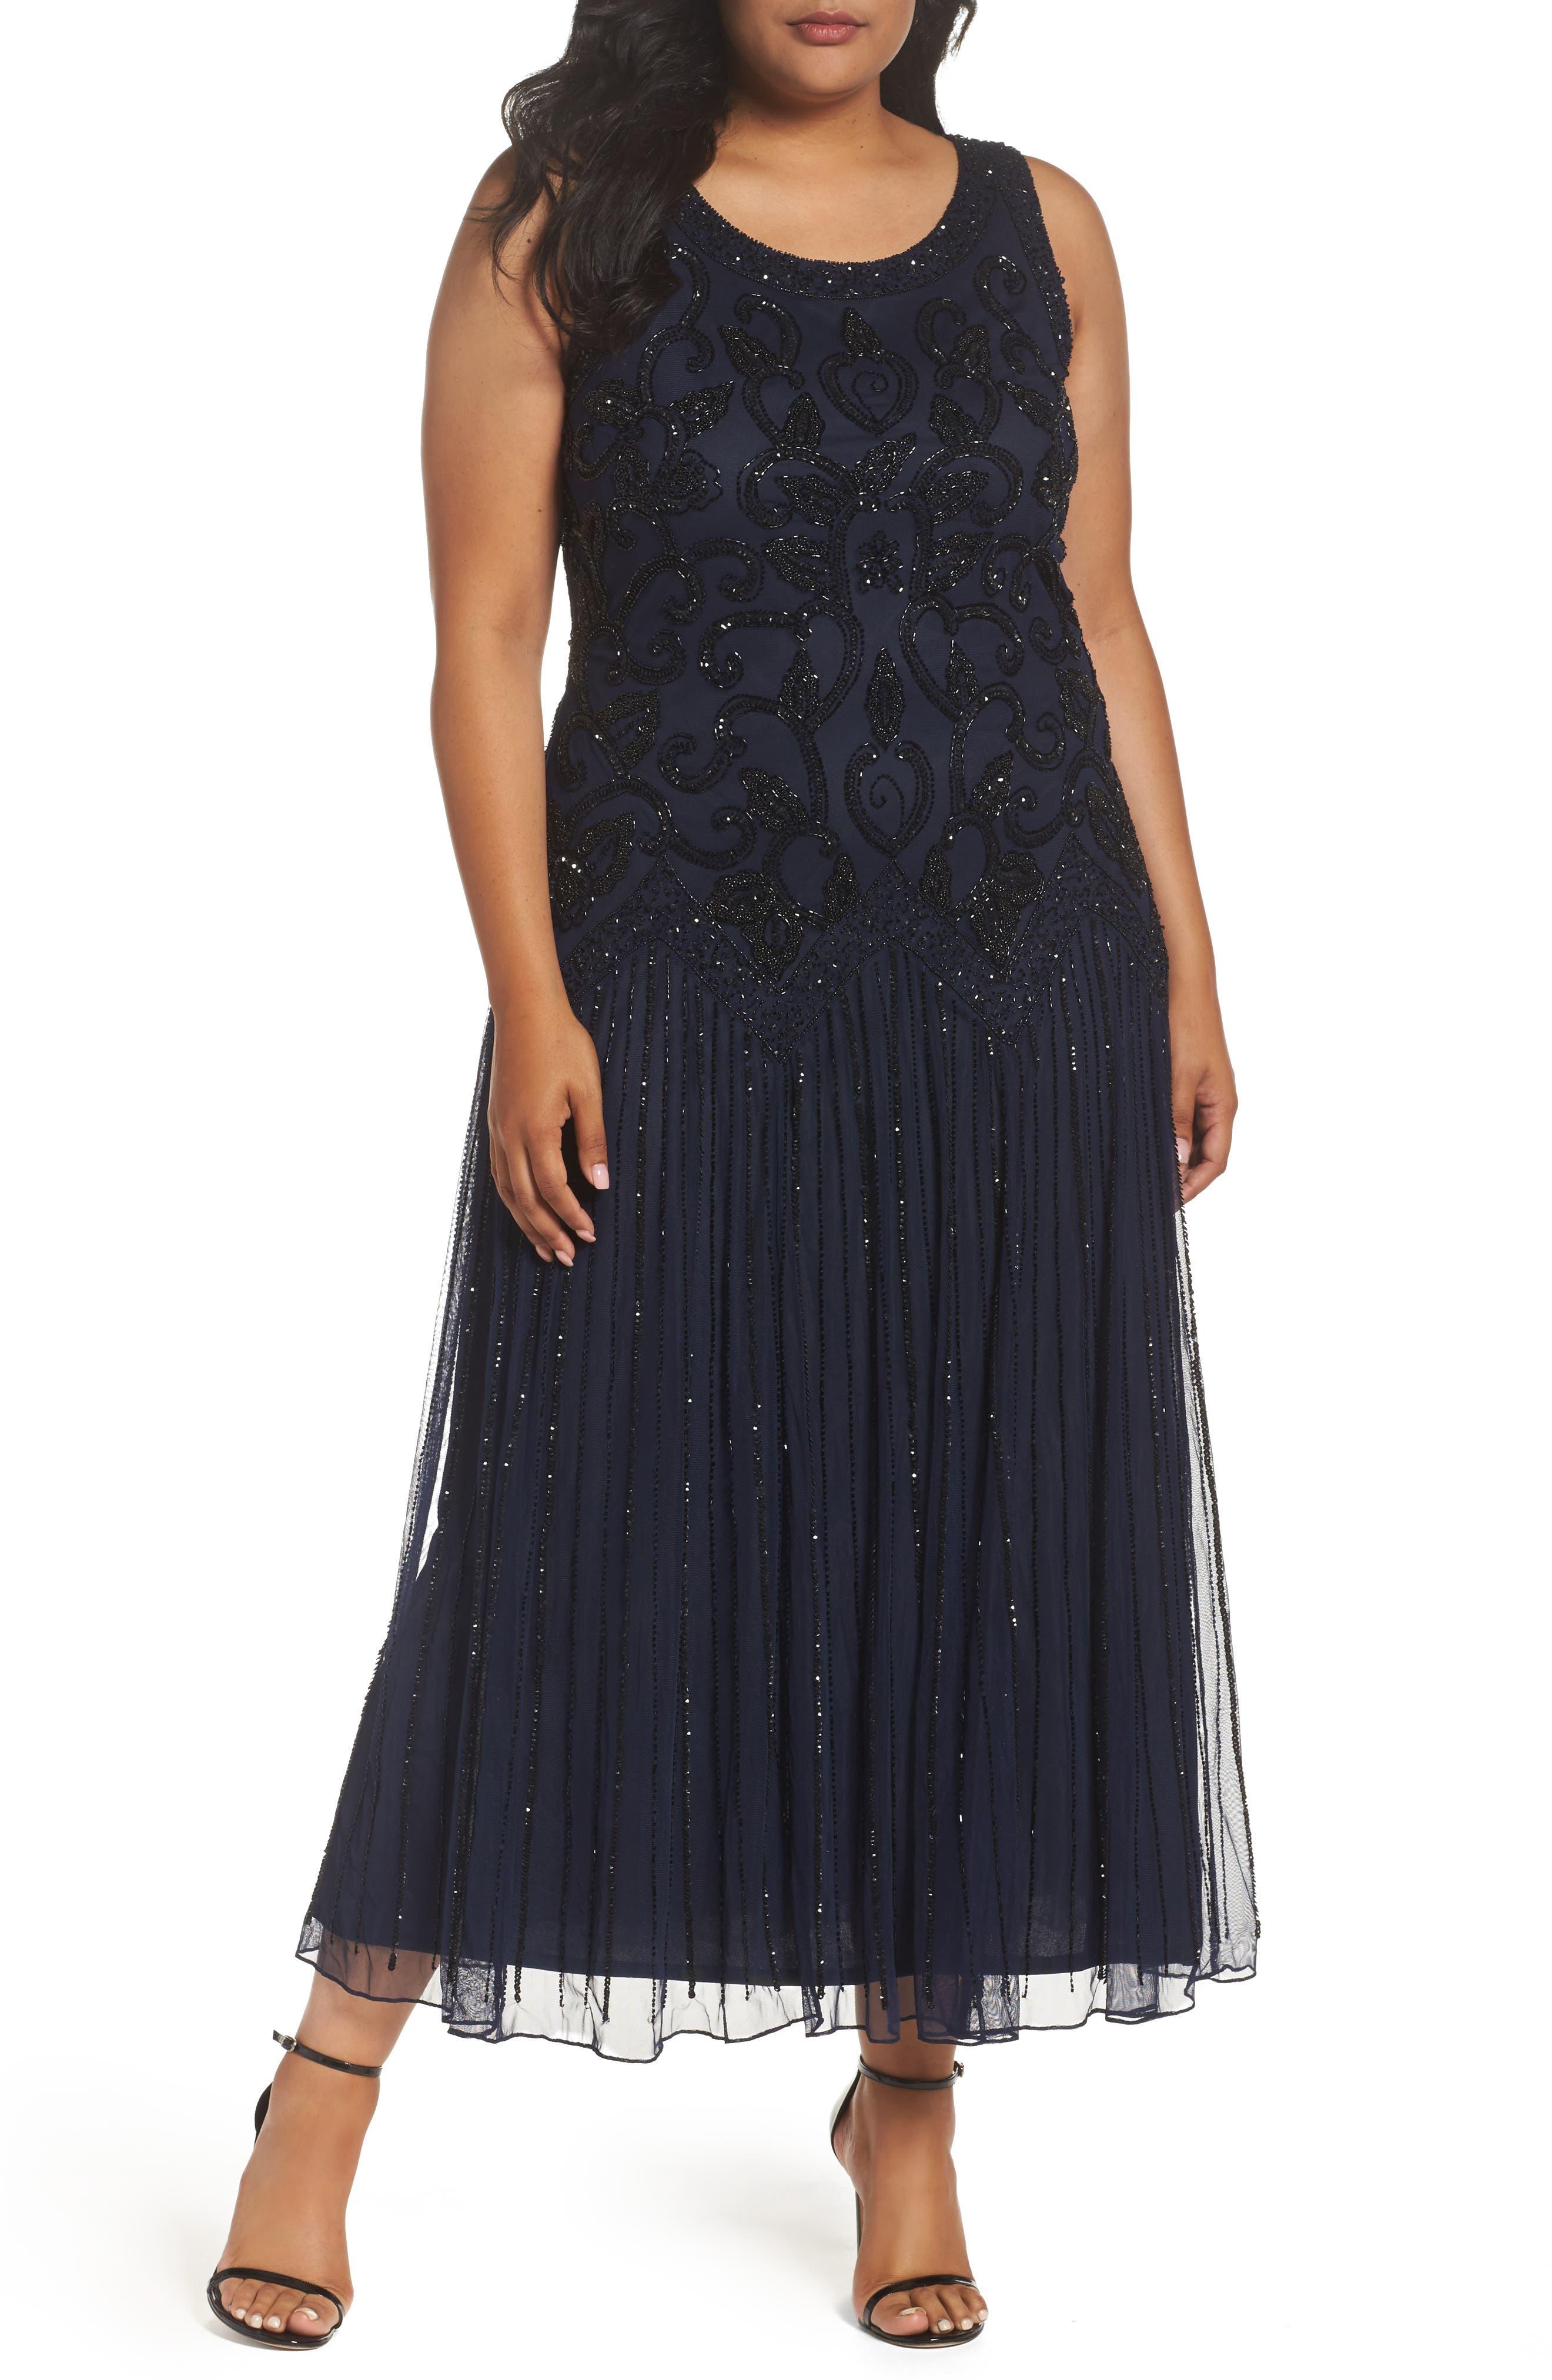 Pisarro Nights Embellished Mesh Dress (Plus Size)